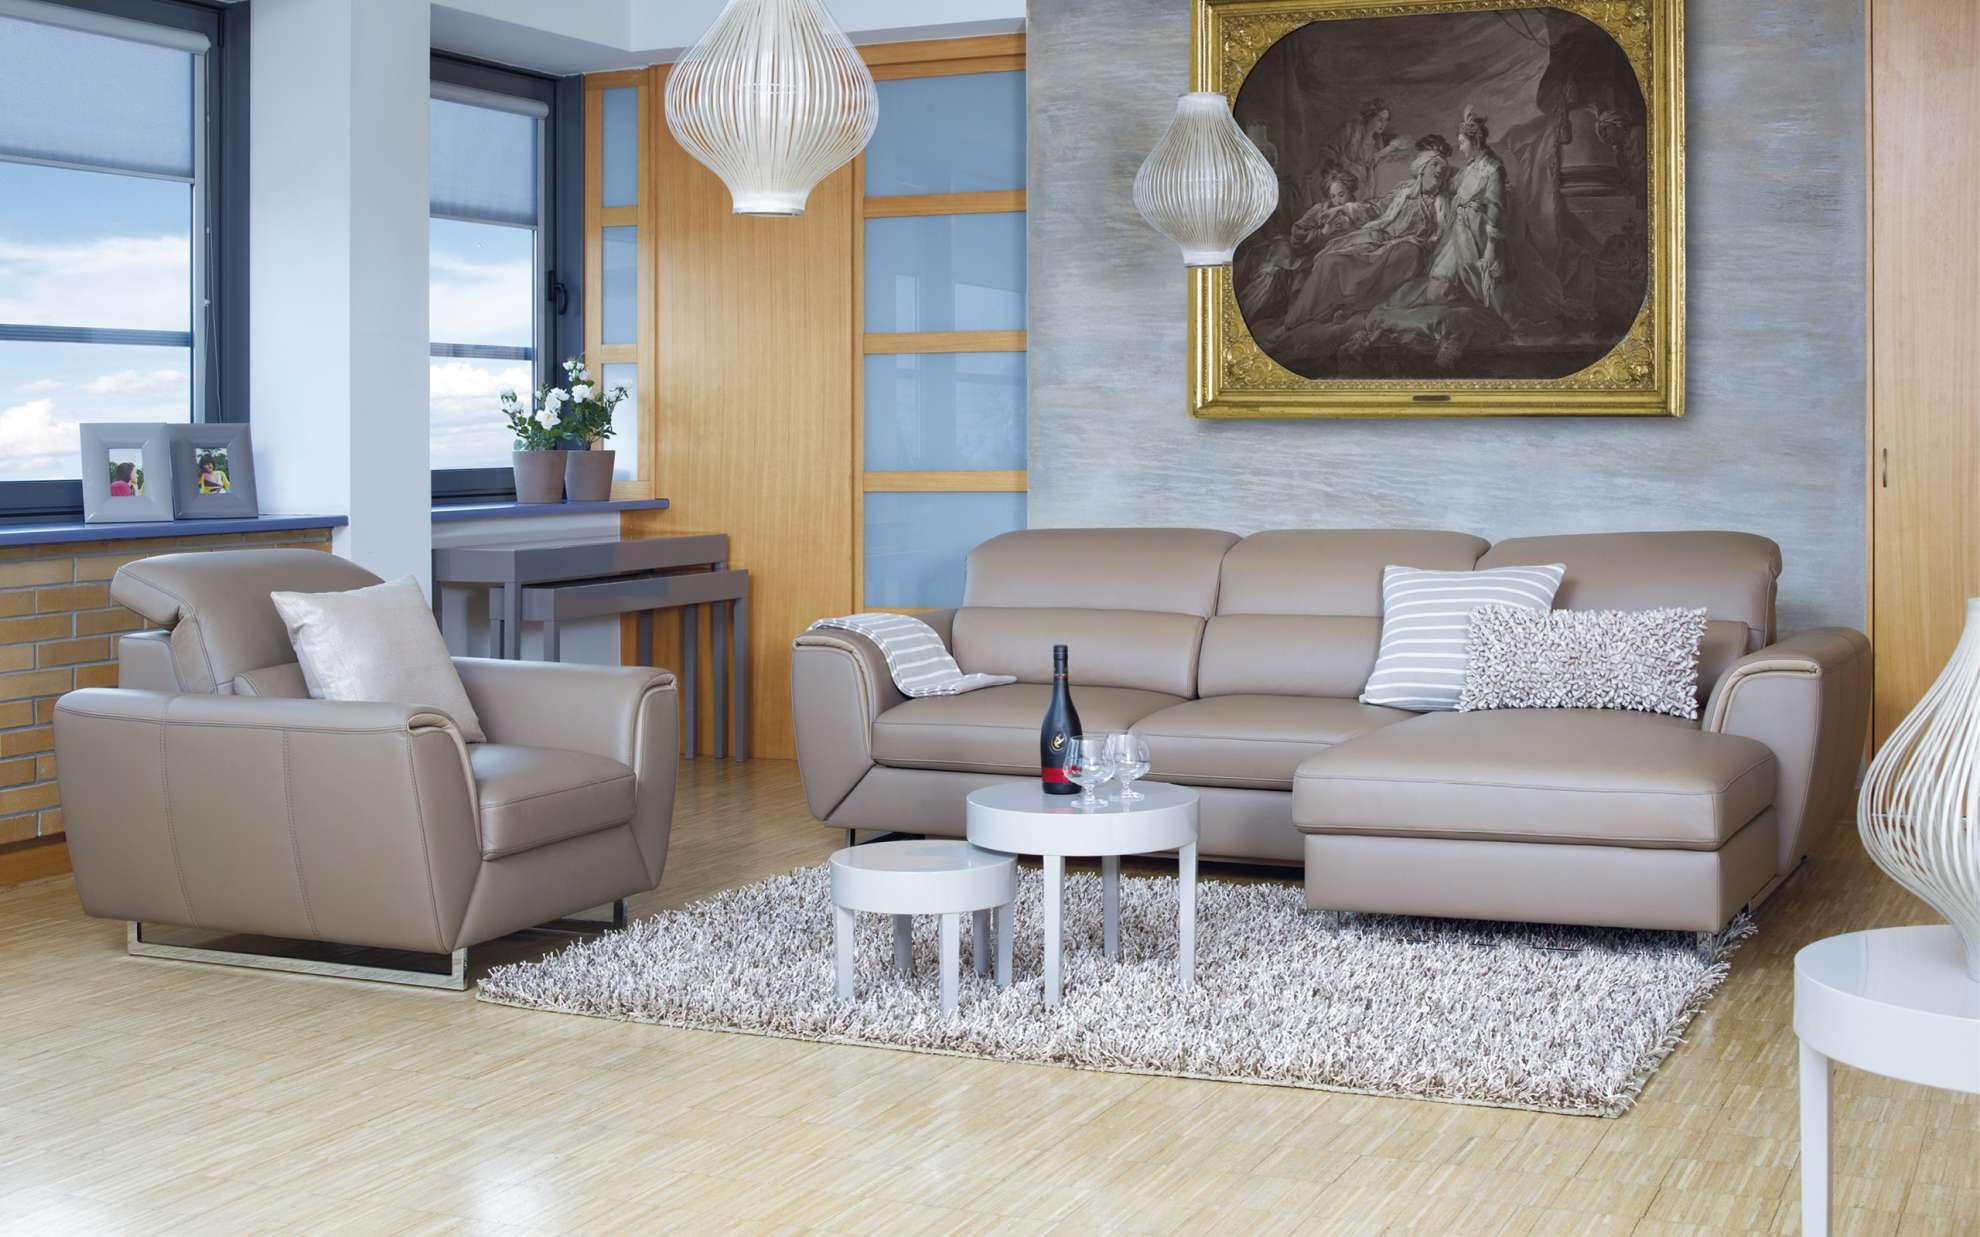 Barevný obývací pokoj